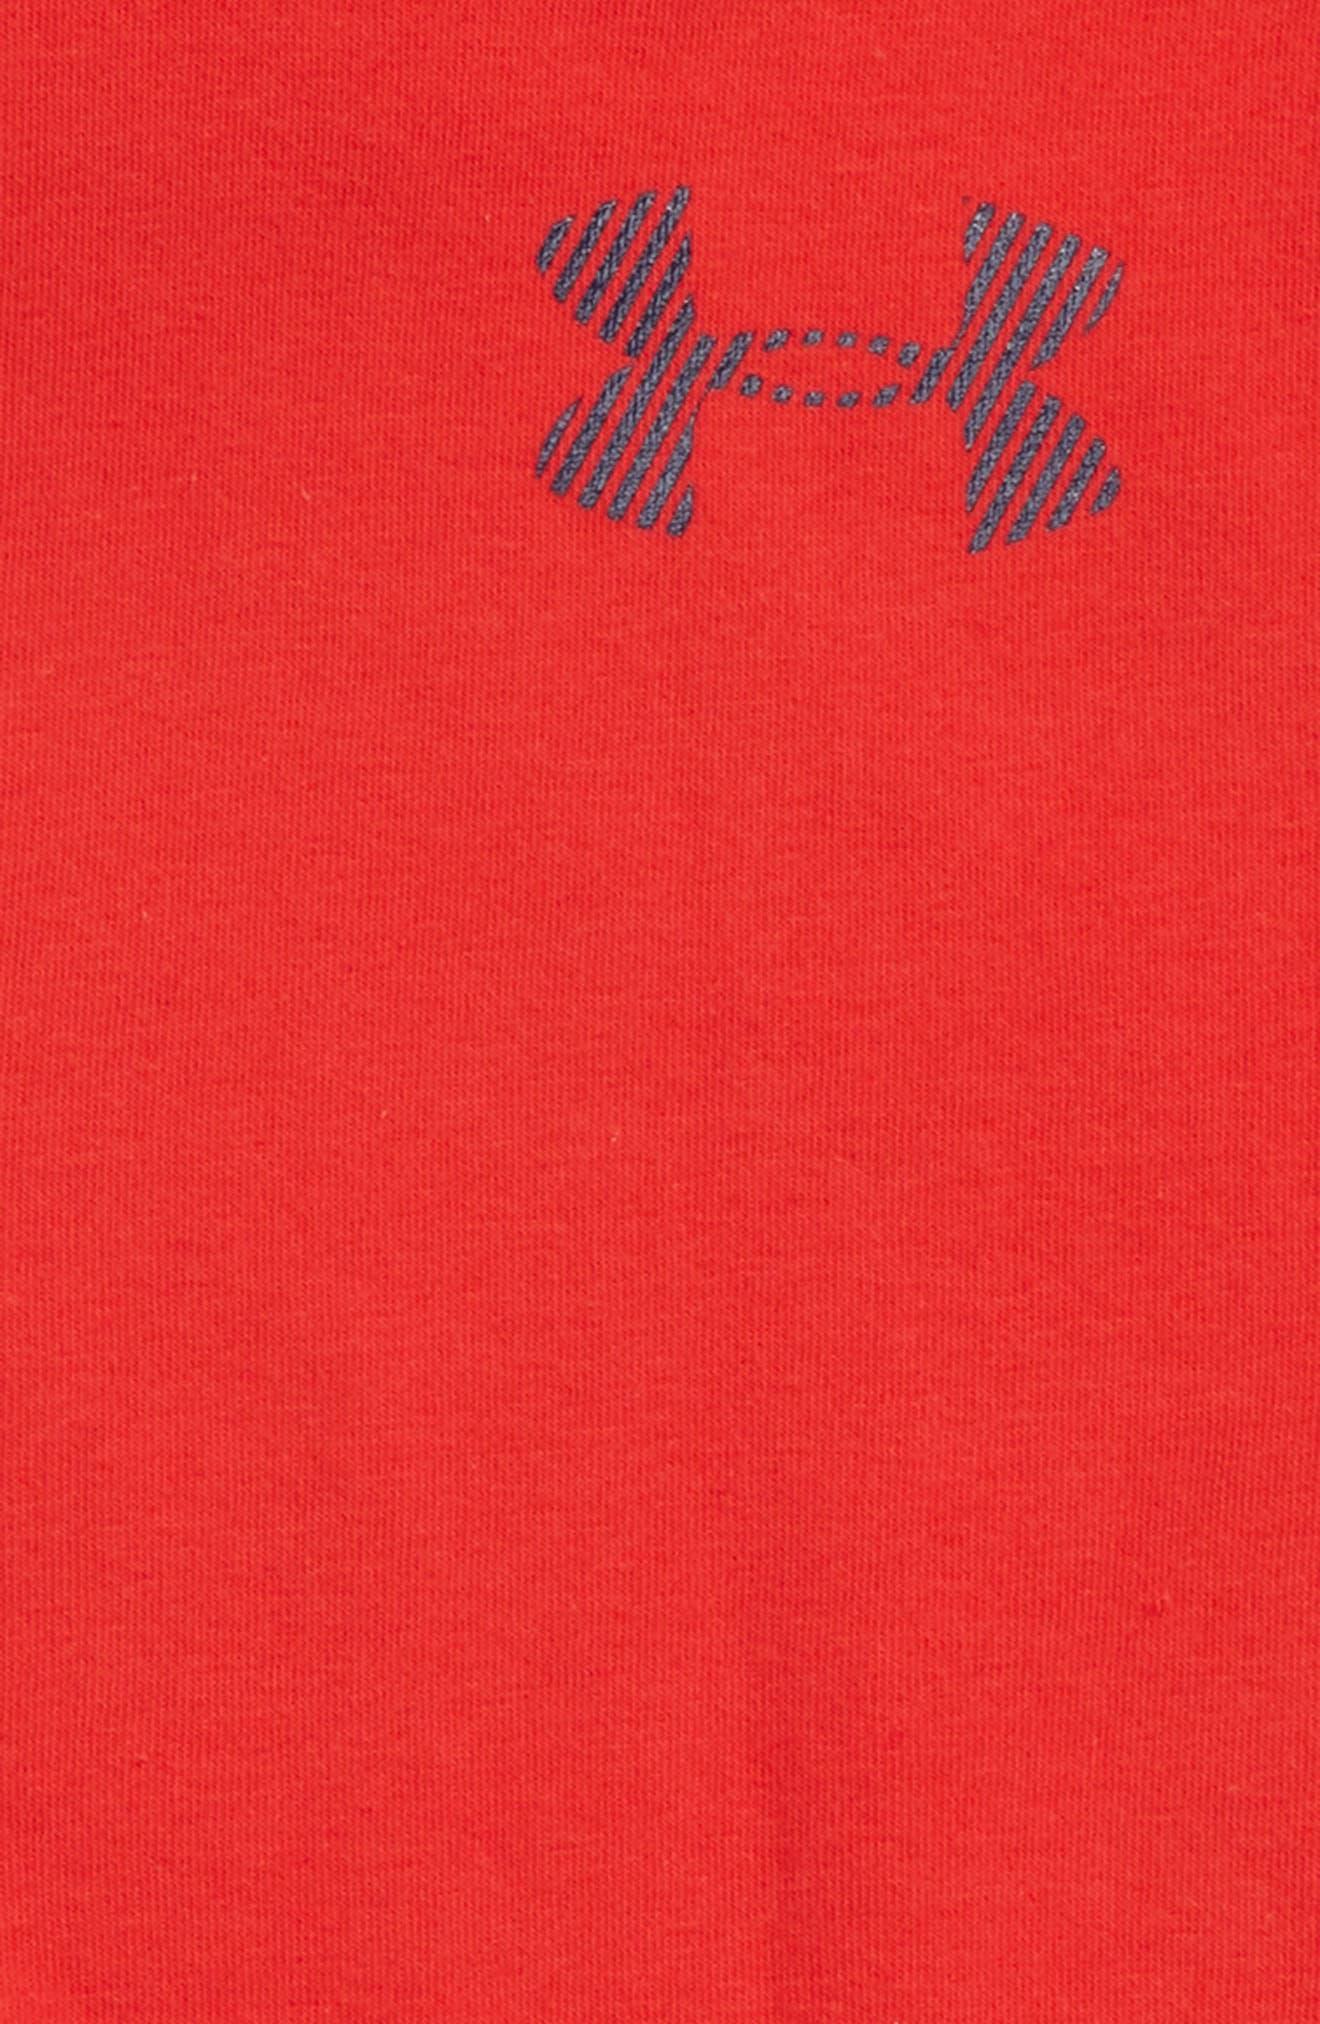 Threadborne Sleeveless Hoodie,                             Alternate thumbnail 2, color,                             RED/ ACADEMY